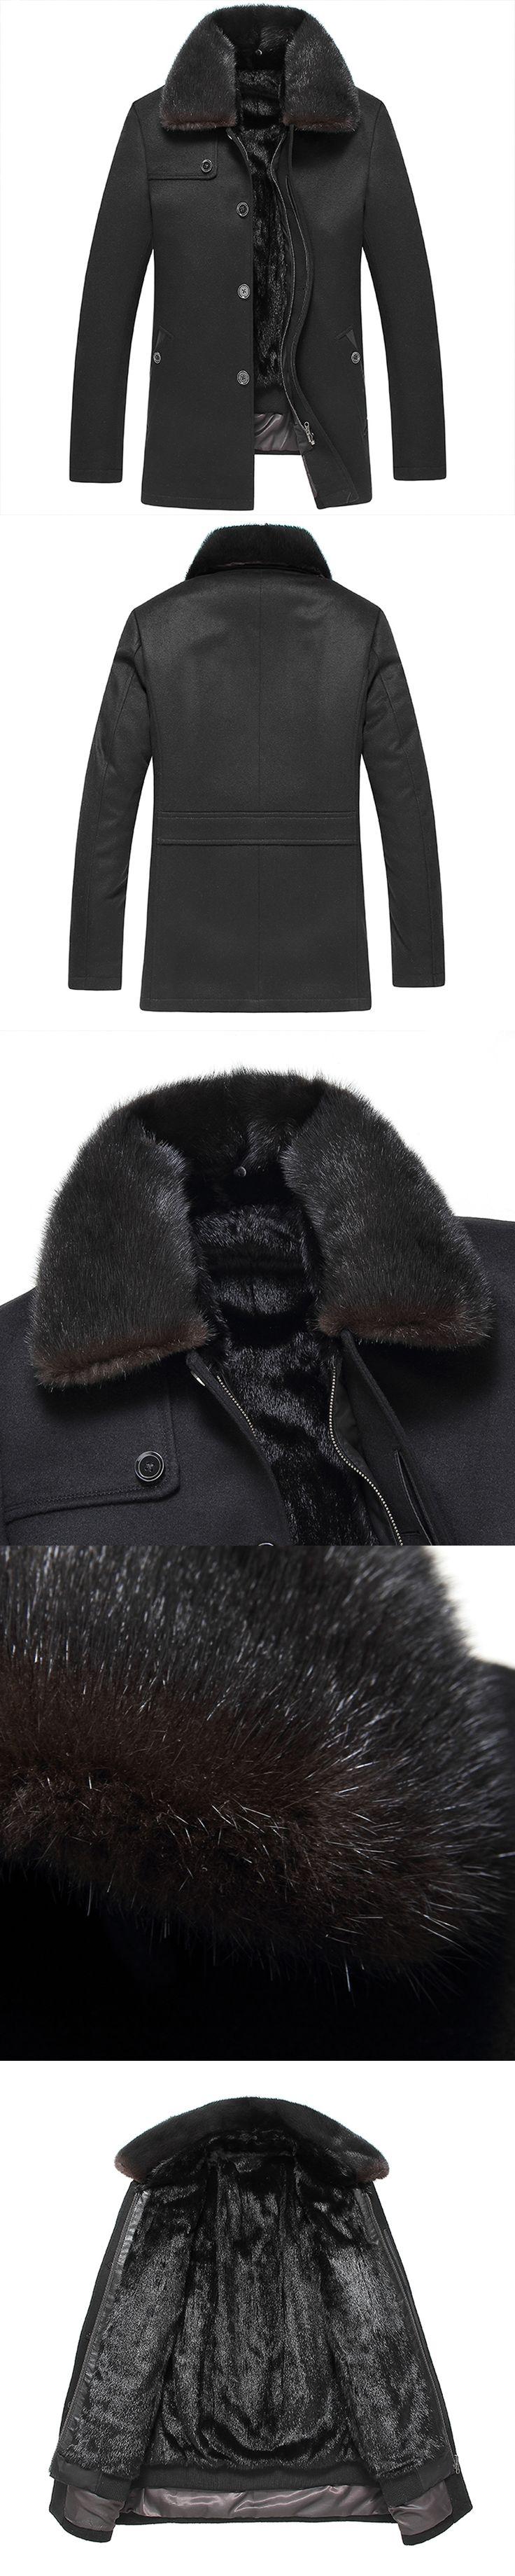 2017 New Mens Sheepskin Coat Winter Male Fur Coat Men's Leather Jacket cashmere Thicken Leather Fur Coat Manteau Fourrure Homme